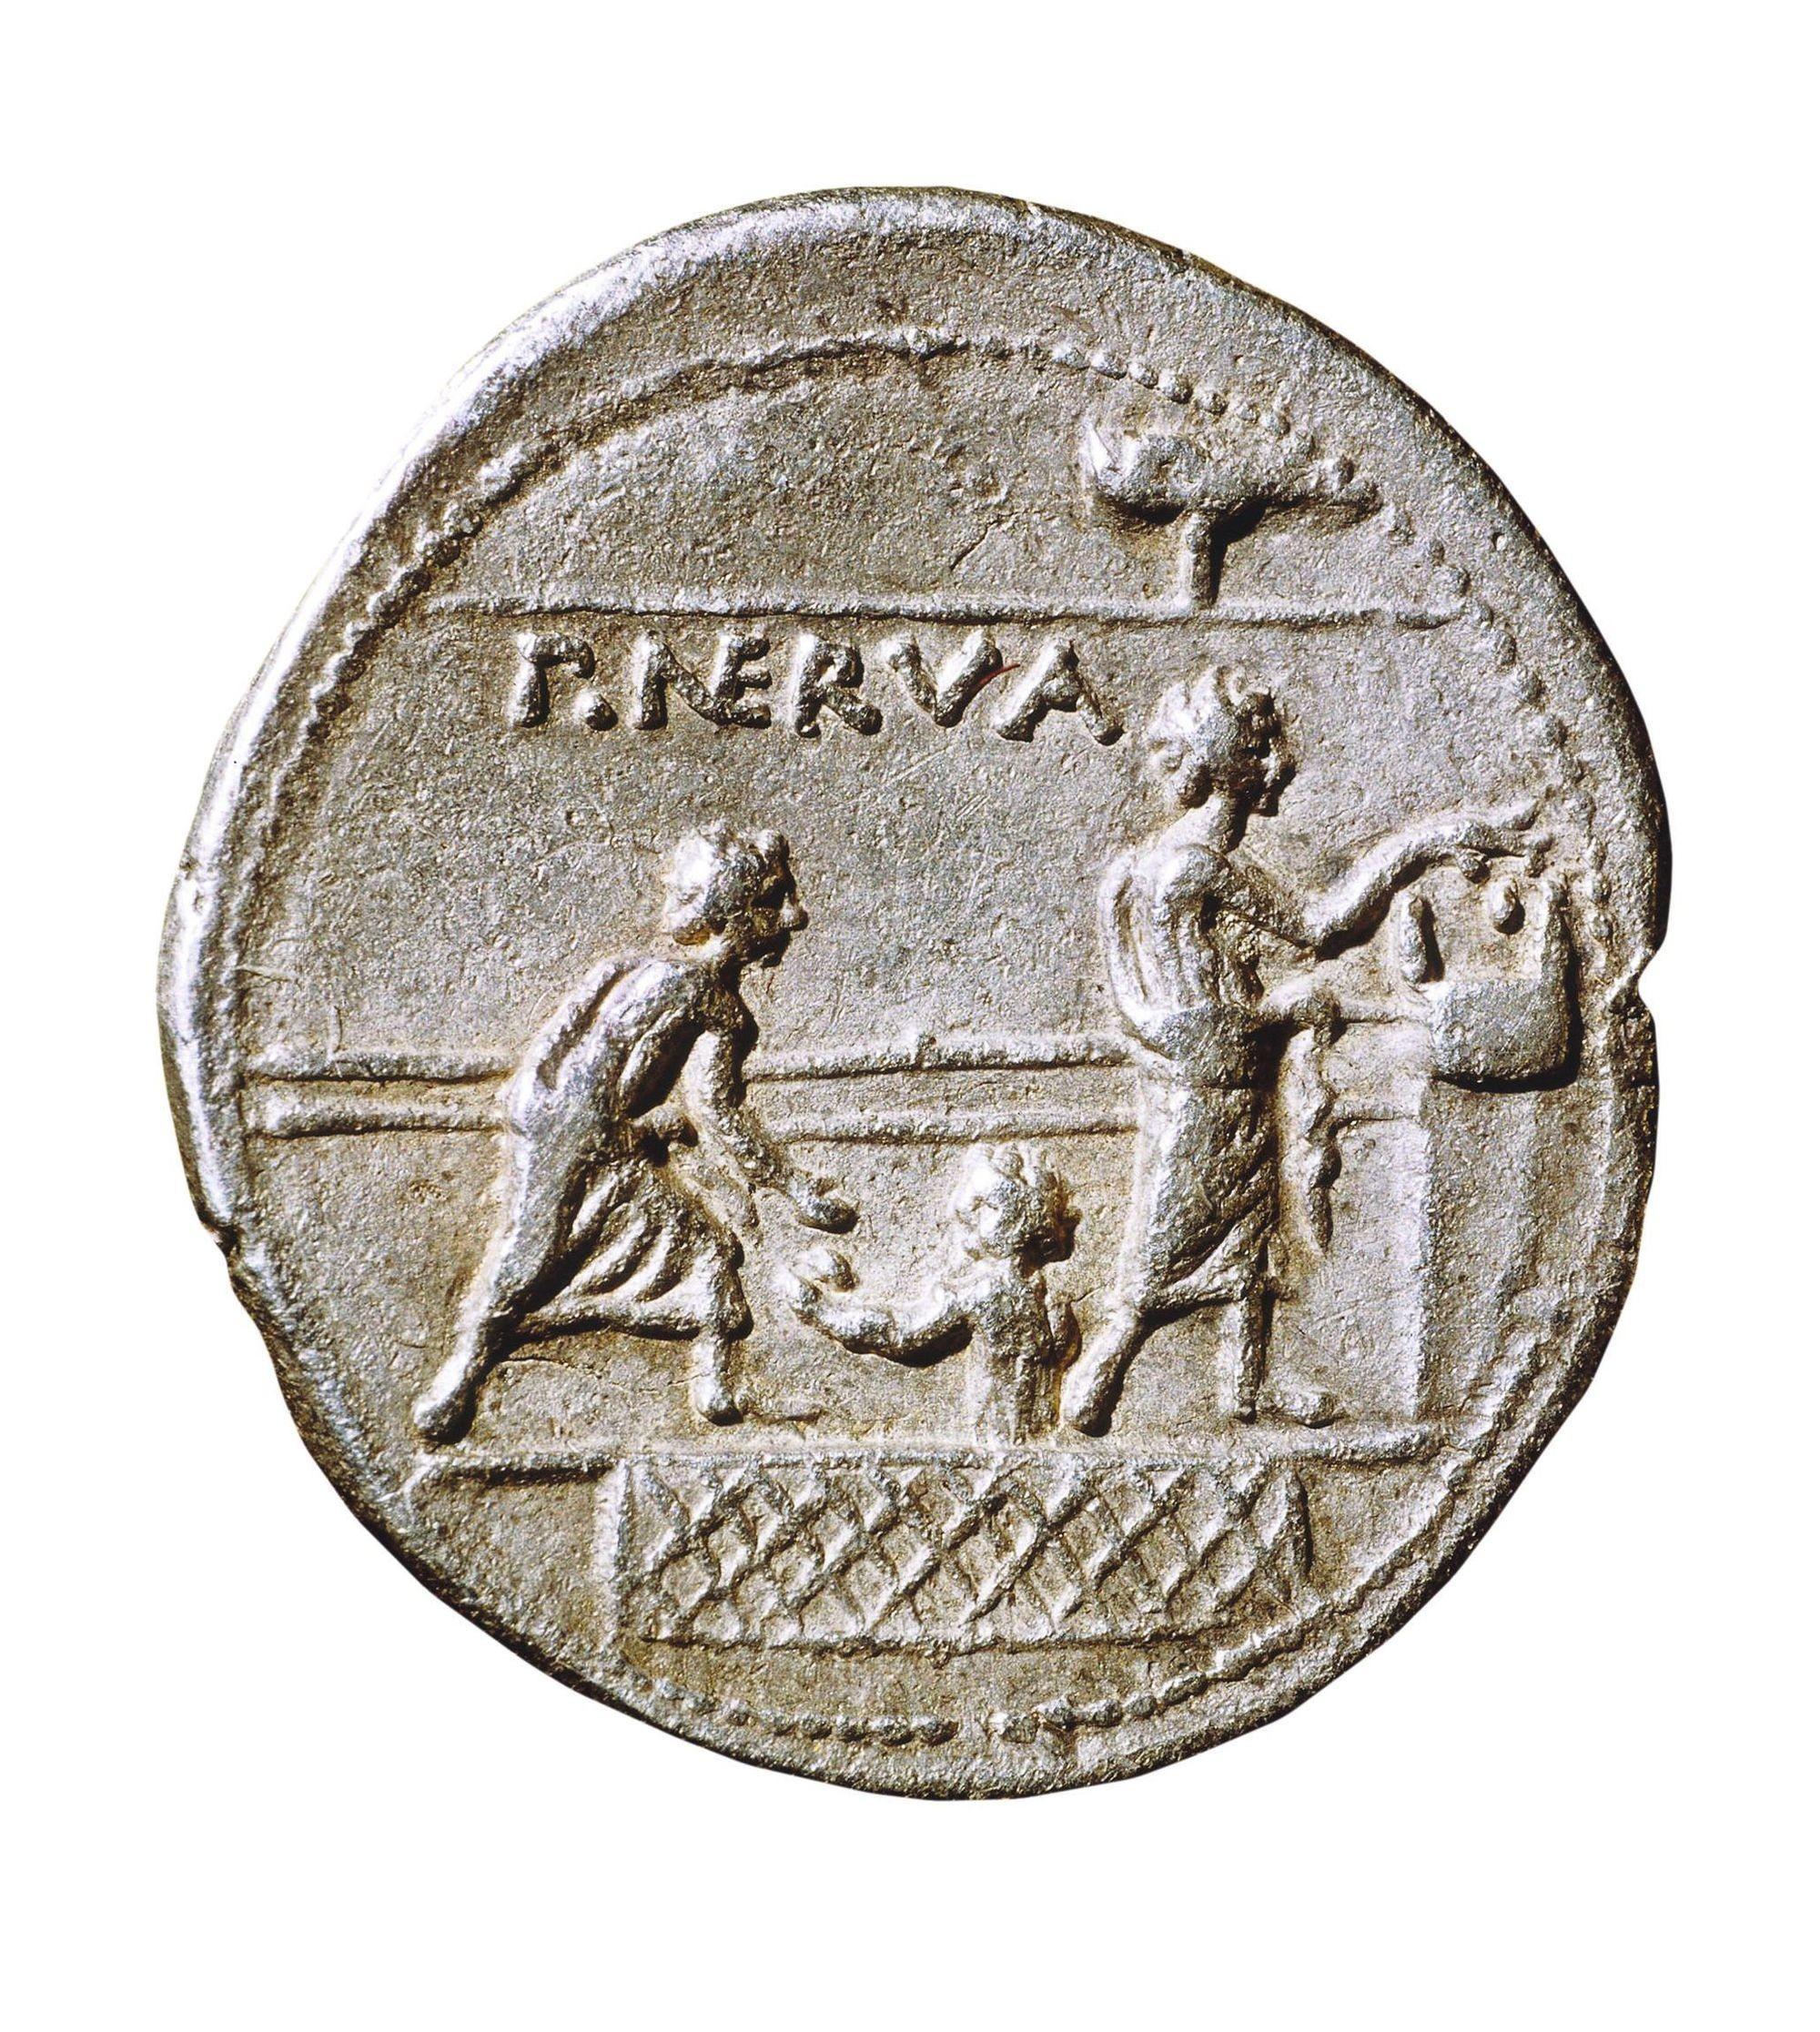 Revers d'une monnaie d'argent, 110 av. J.-C